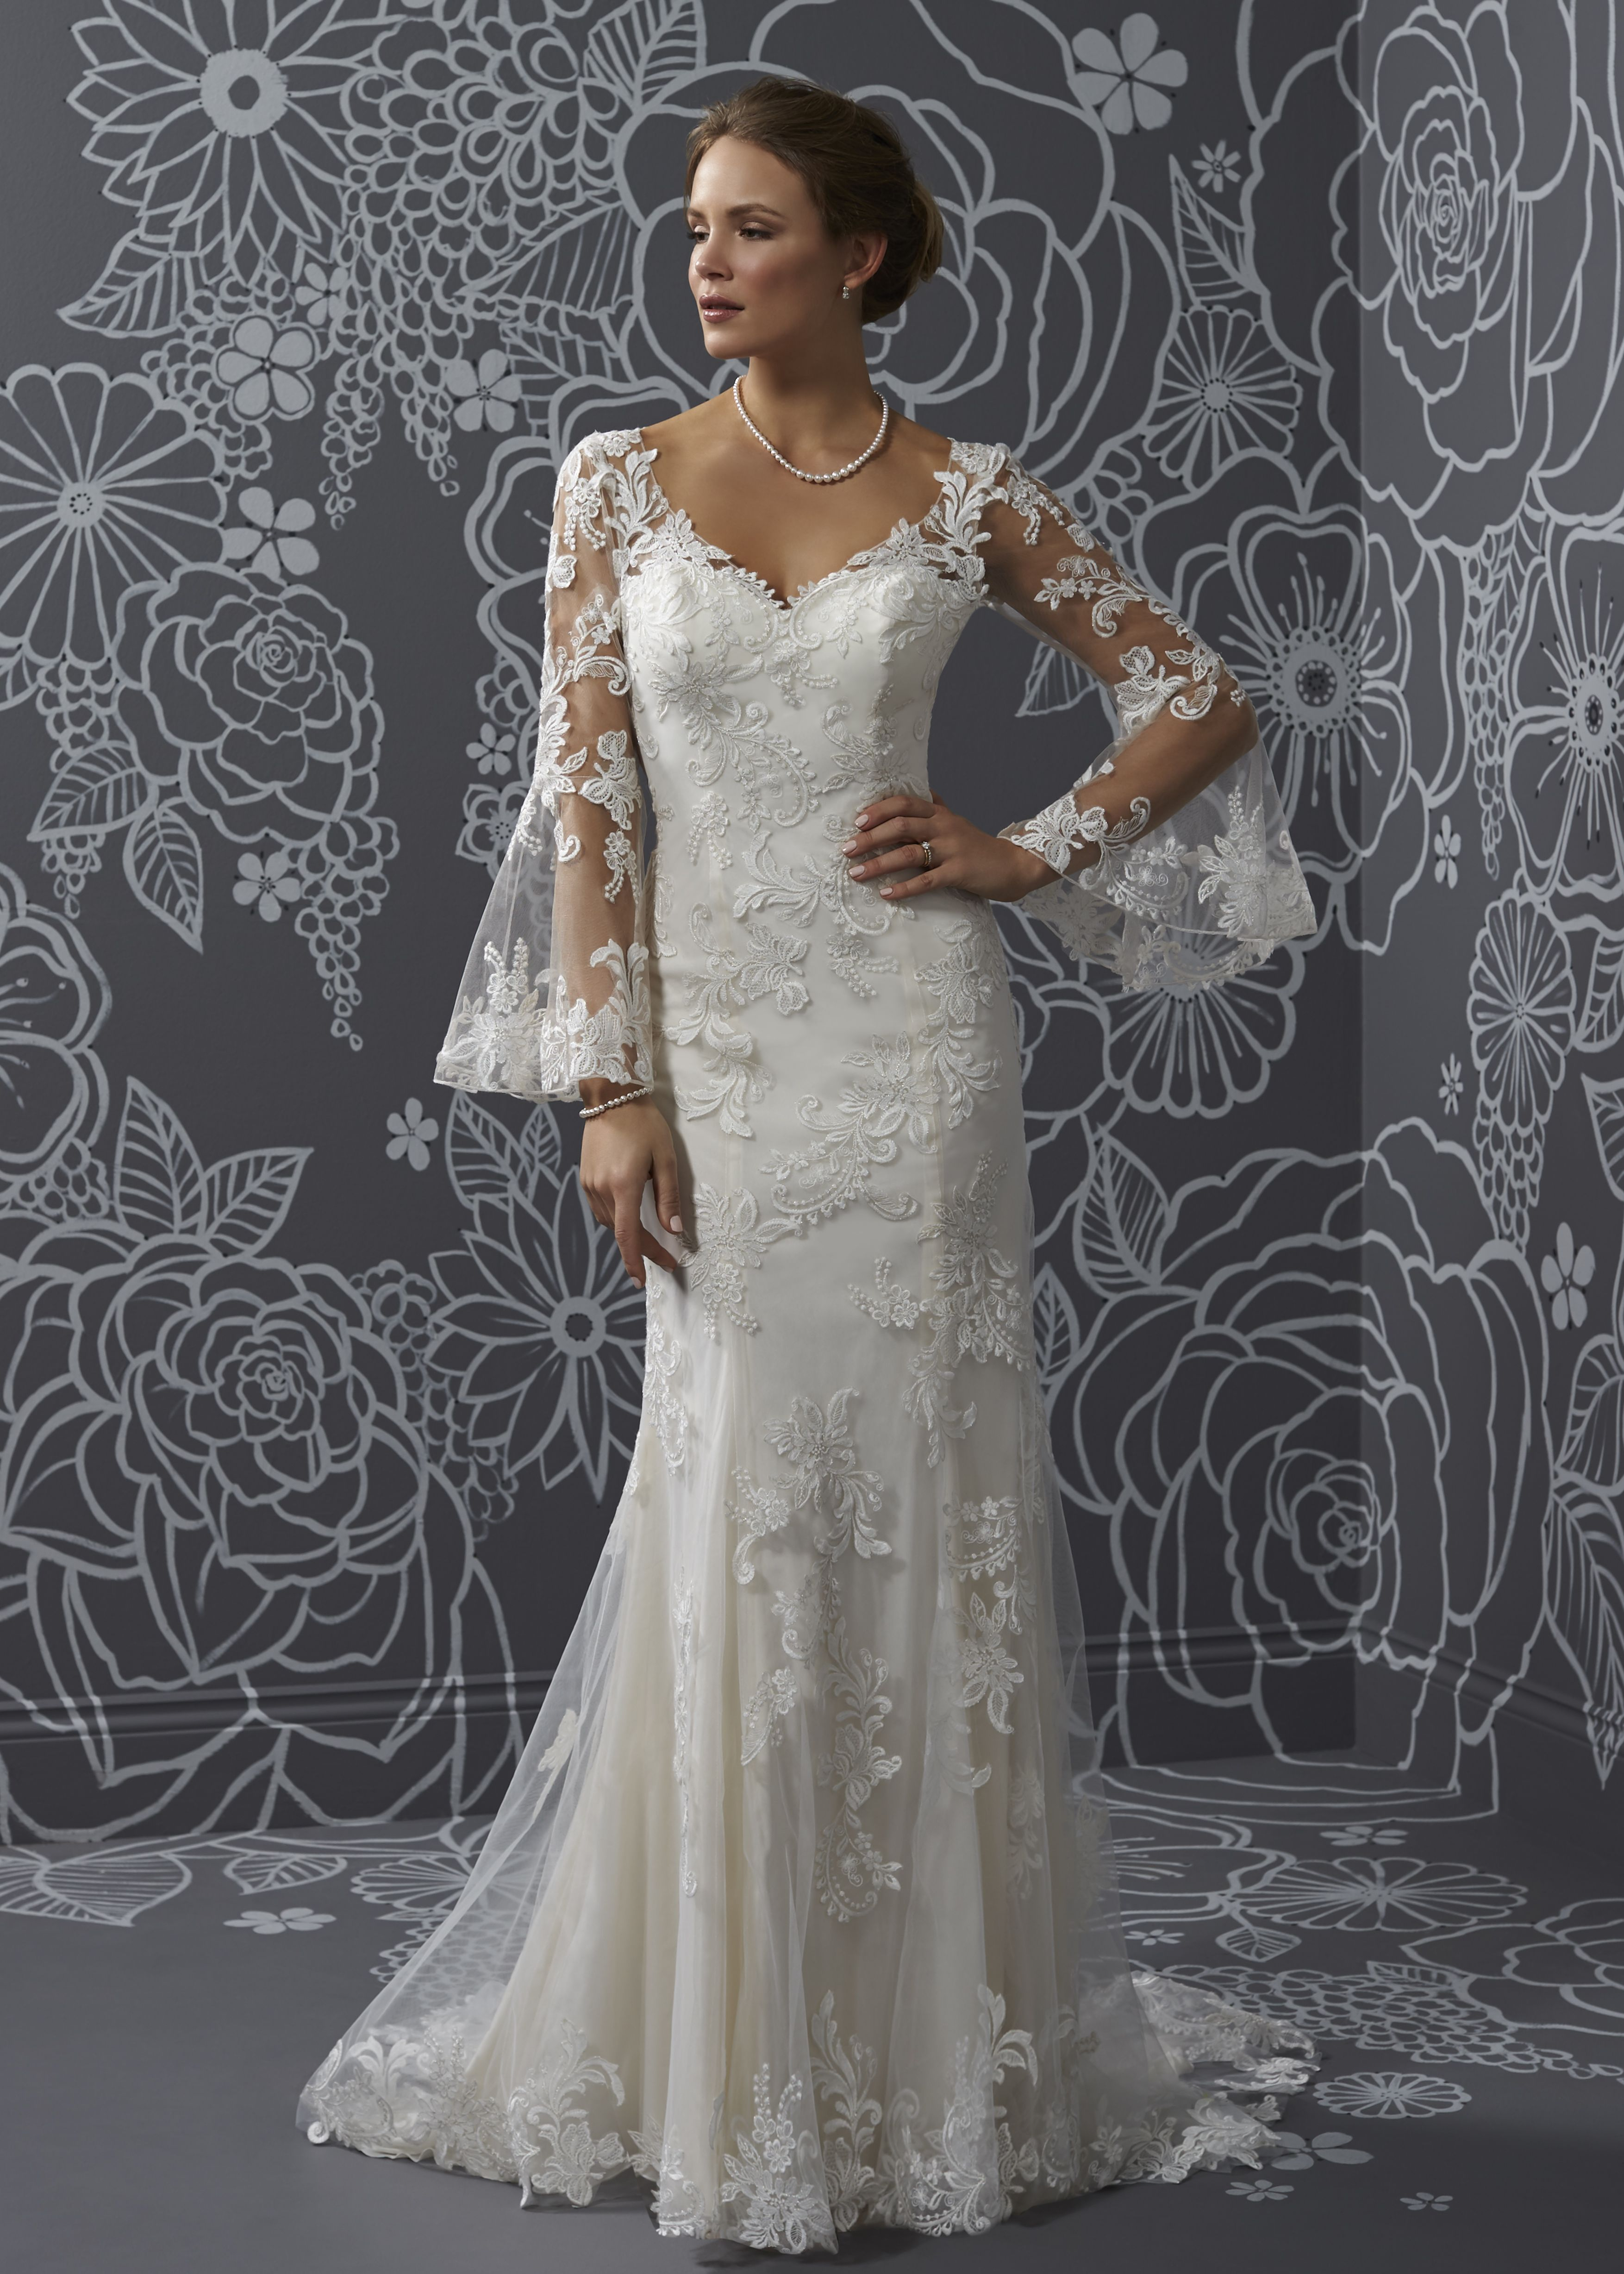 Elvira | weddings | Pinterest | White wedding gowns, Vintage ...